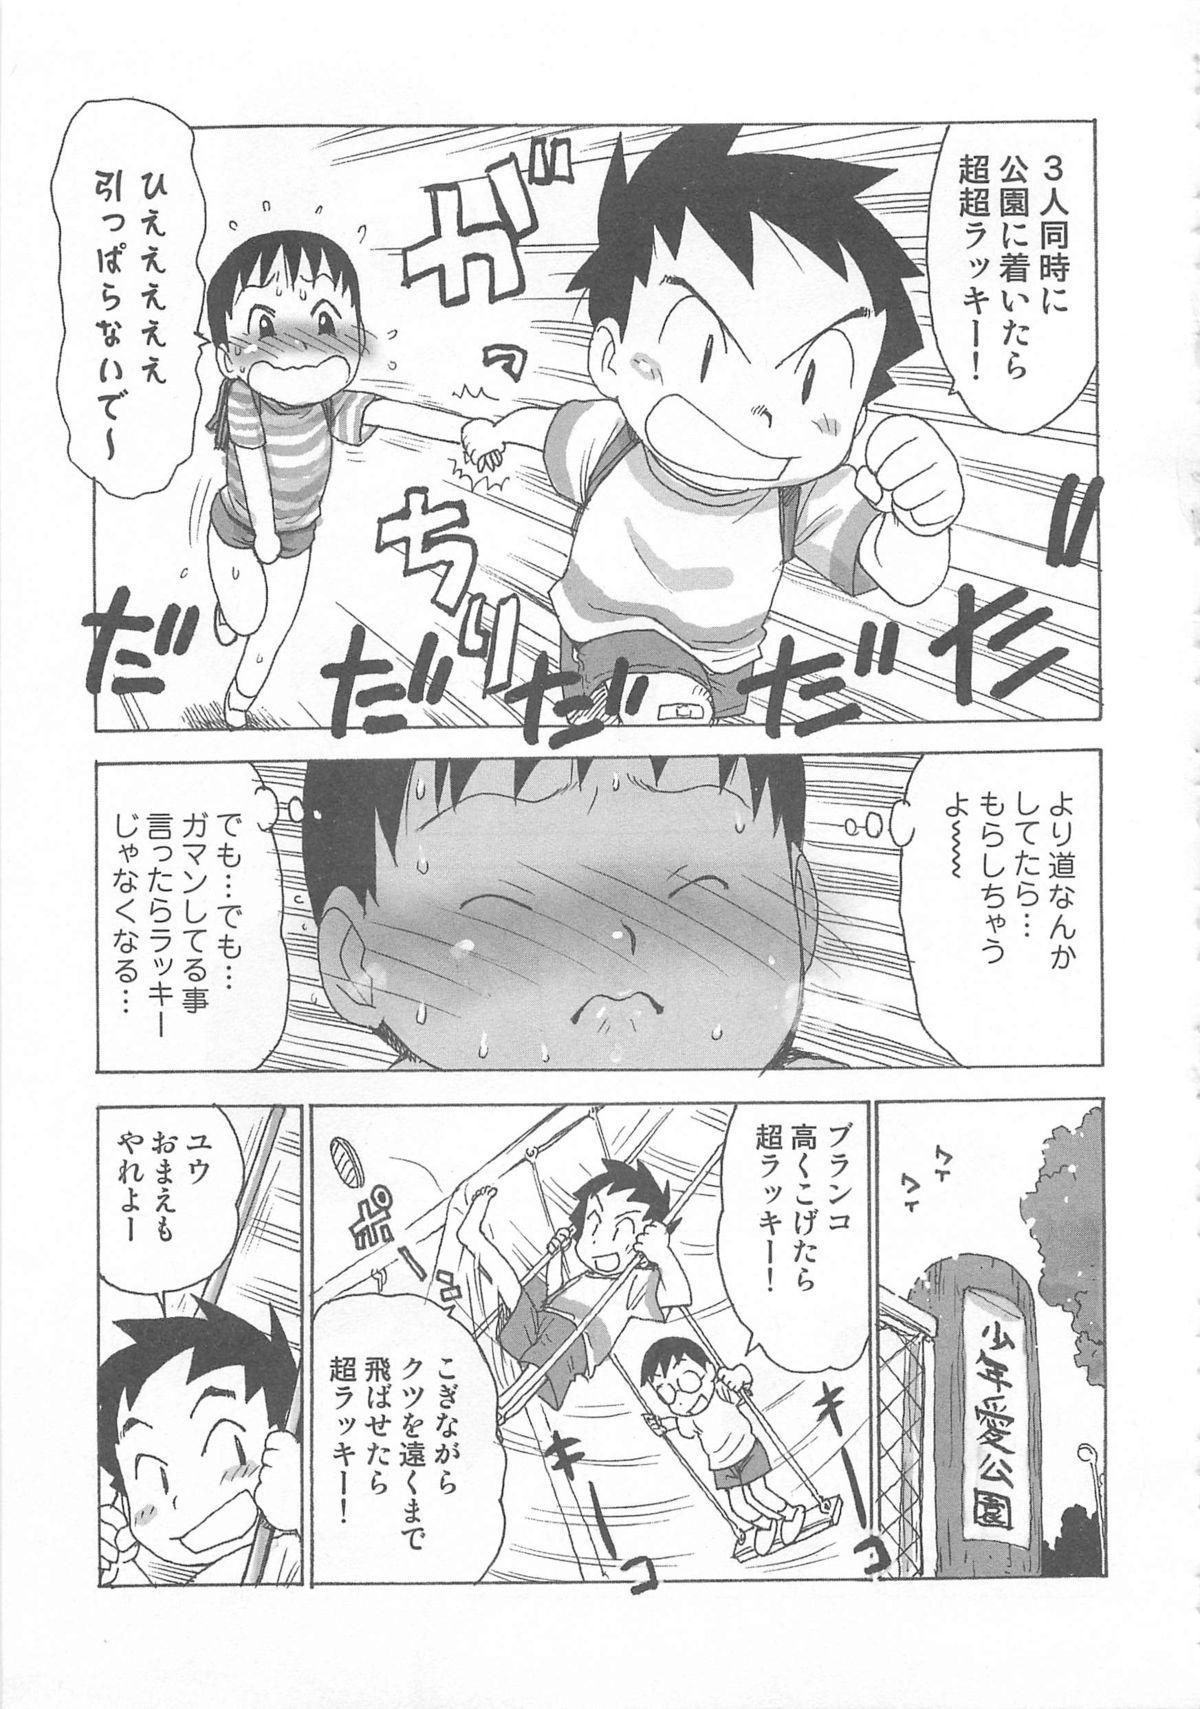 Otokonoko HEAVEN Vol. 02 Dokidoki Chikan Taiken 97